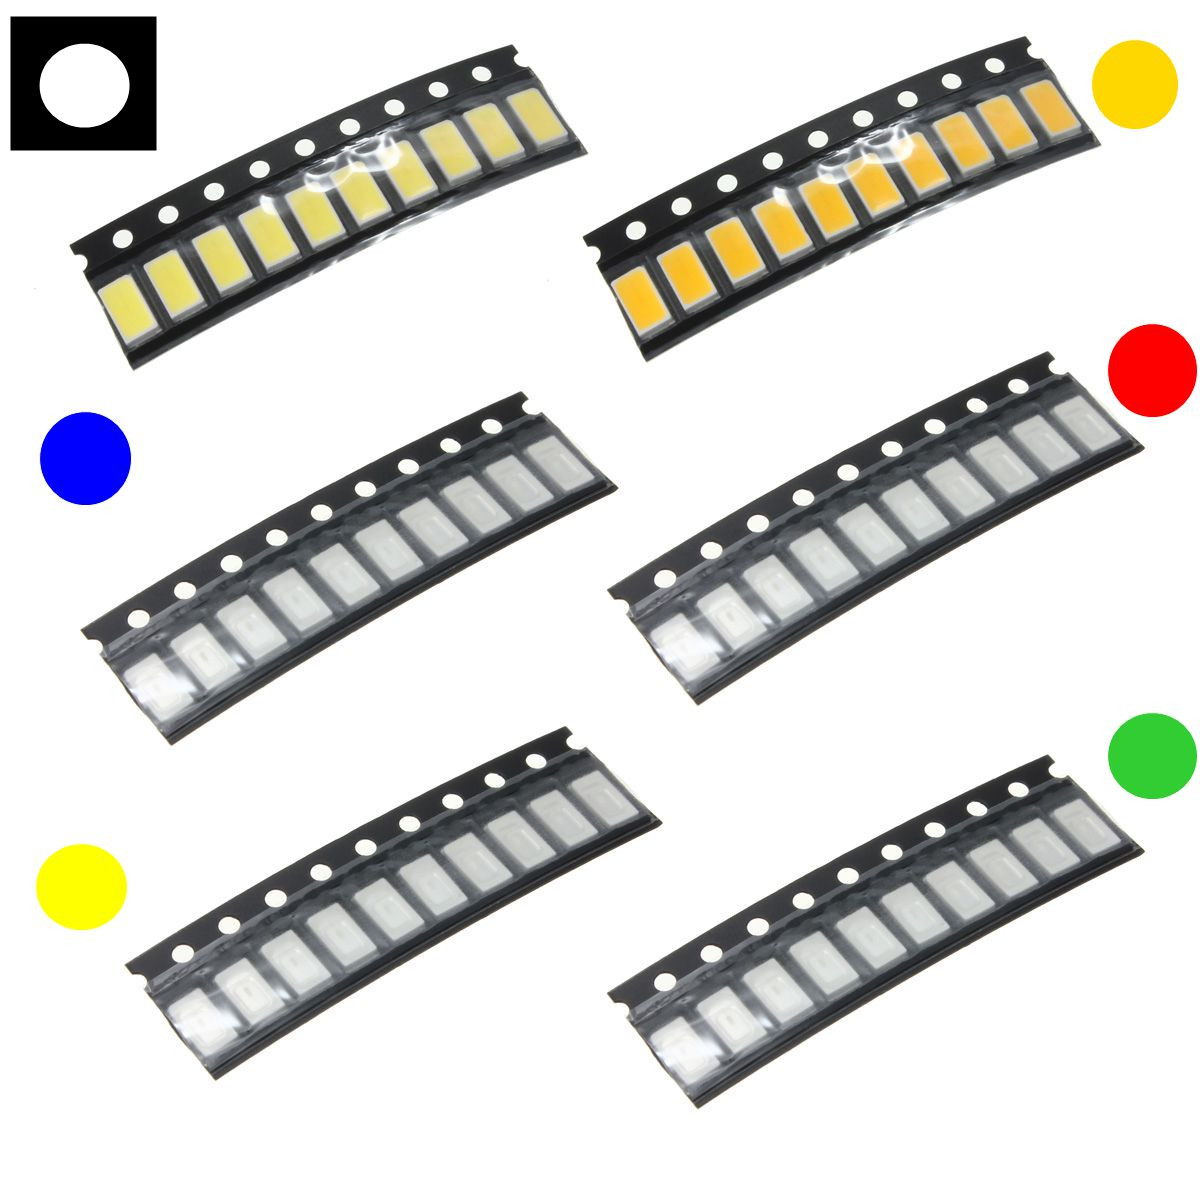 10 pcs 0603 Colorful SMD SMT LED Light Lamp Beads For Strip Lights